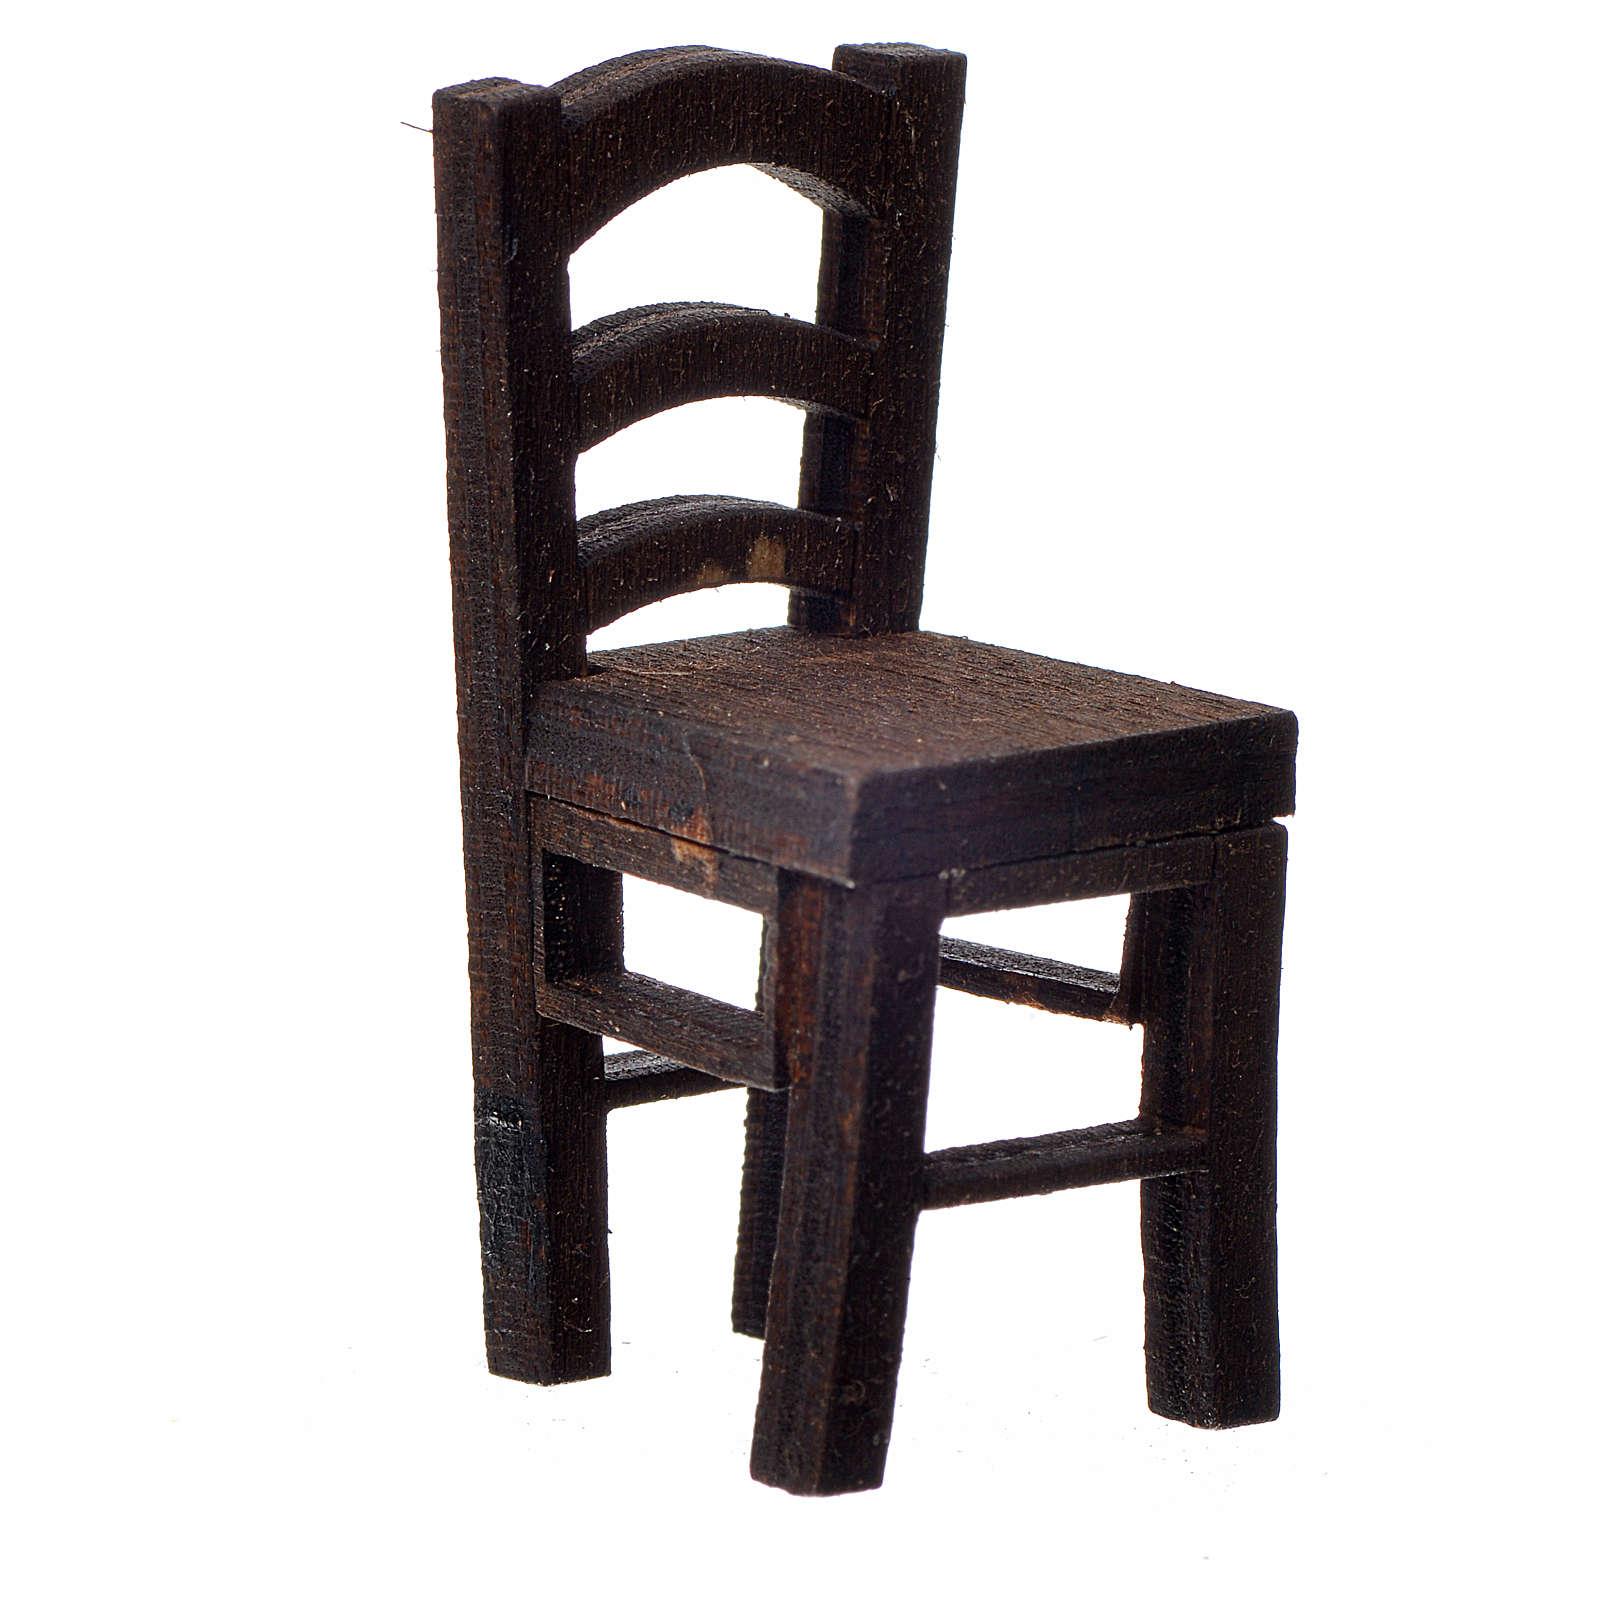 Sedia legno presepe 4x2x2 4